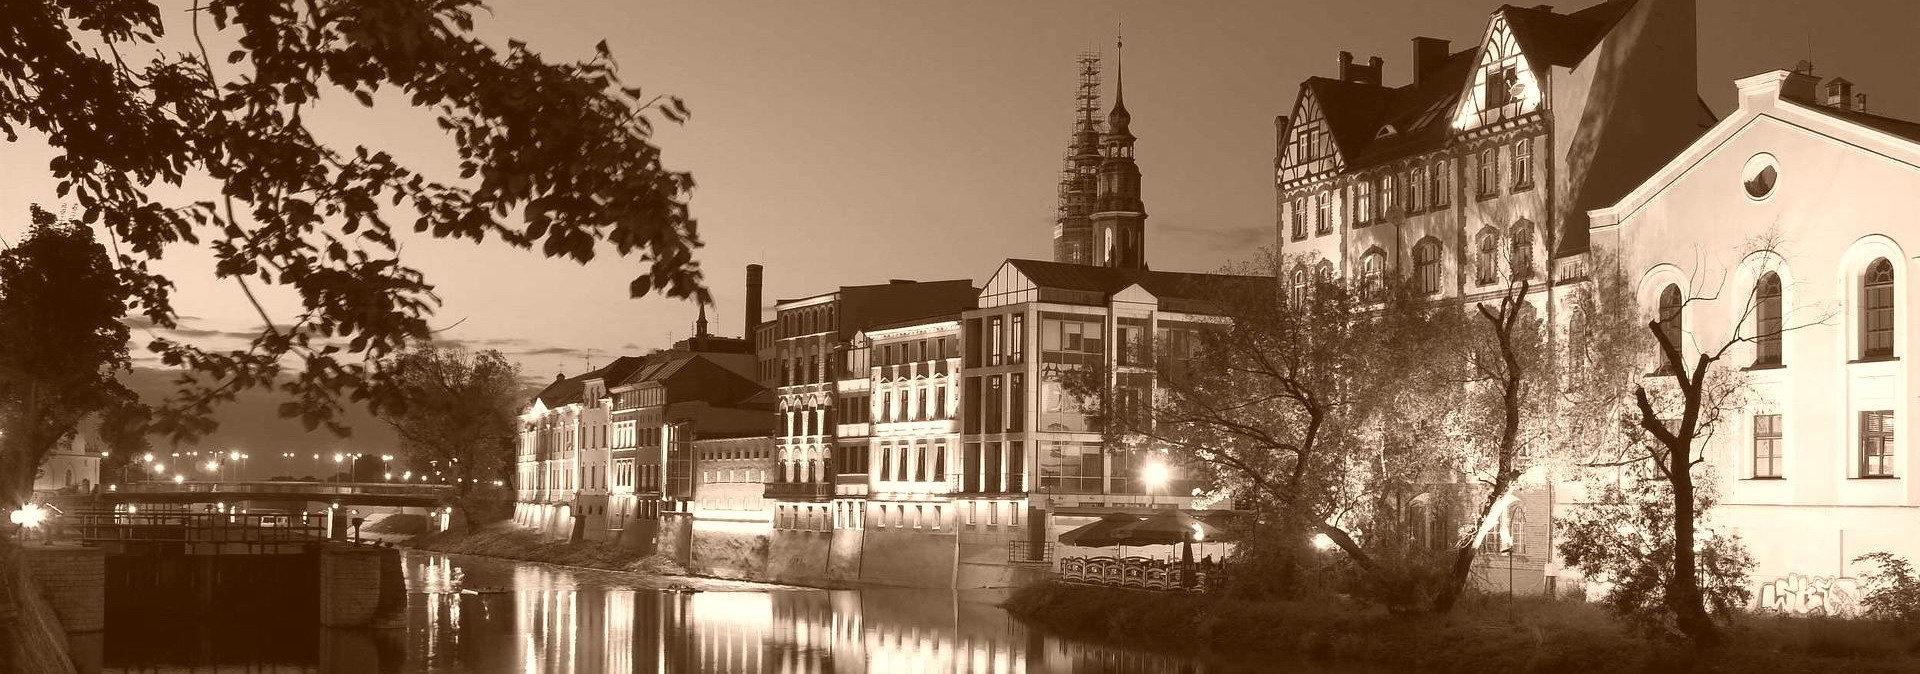 Kancelaria Opole